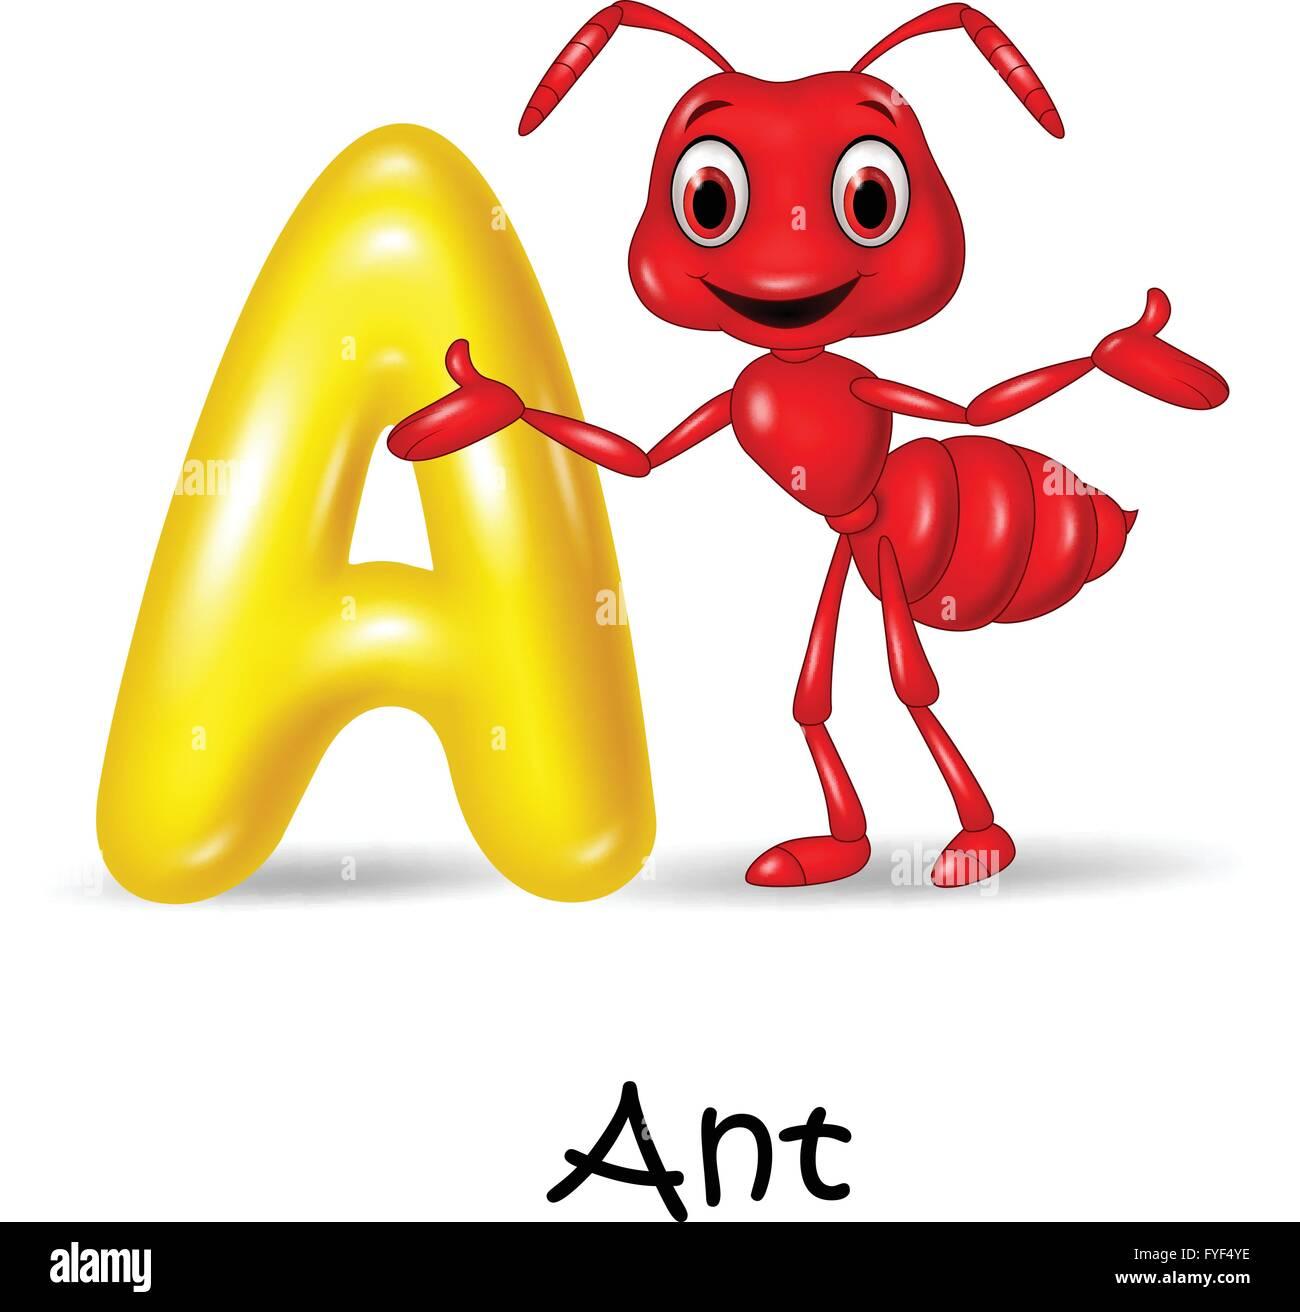 Illustration A Of Letter For Ant Stock Vector Art